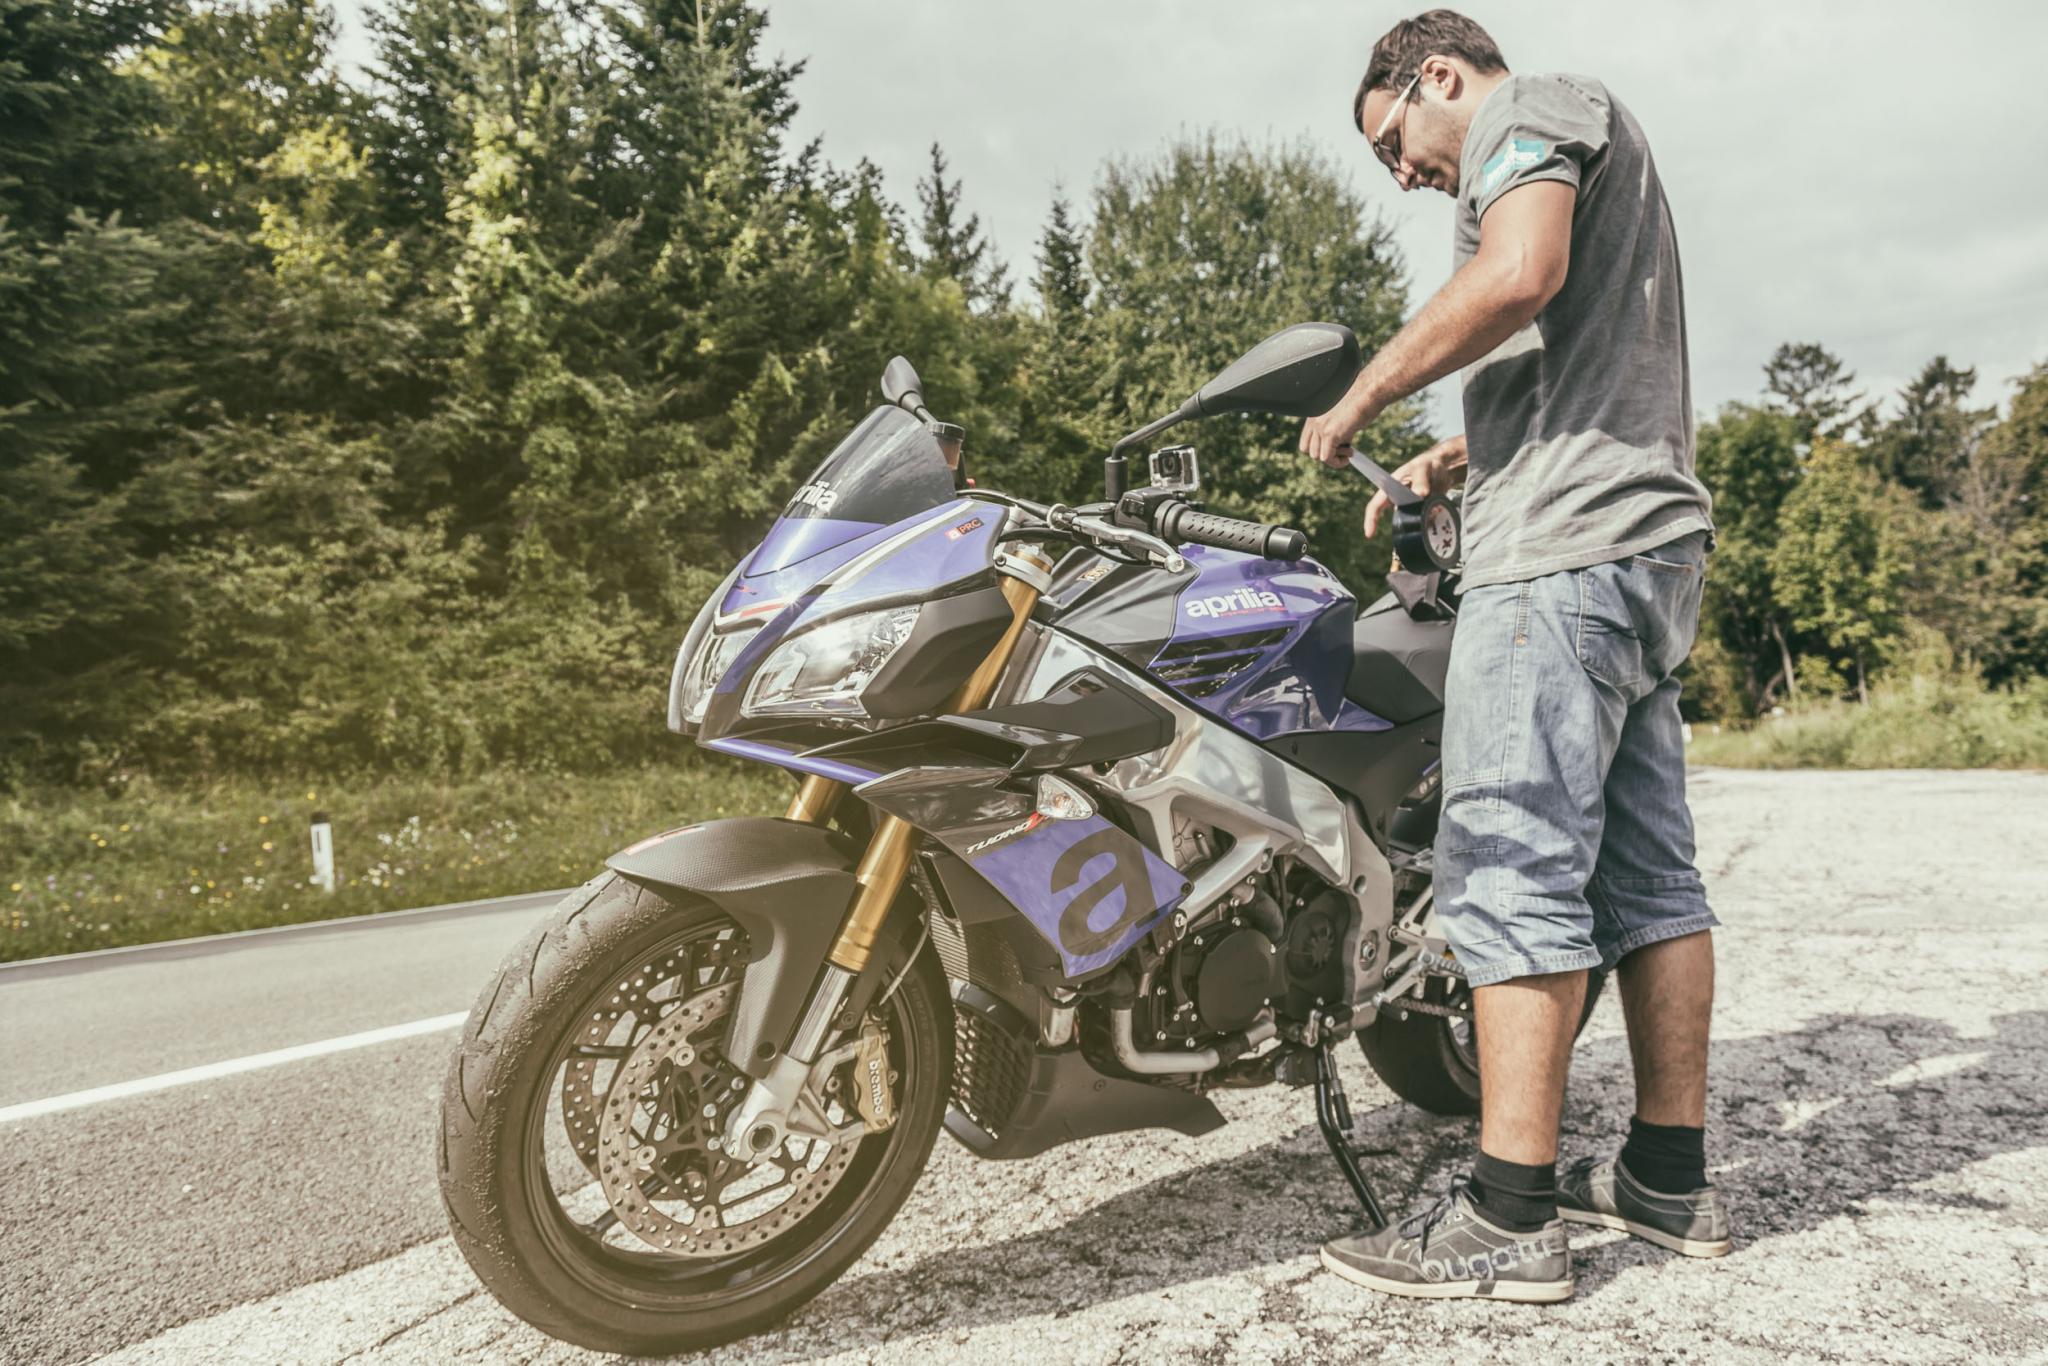 naked bike vergleichstest hinter den kulissen motorrad fotos motorrad bilder. Black Bedroom Furniture Sets. Home Design Ideas